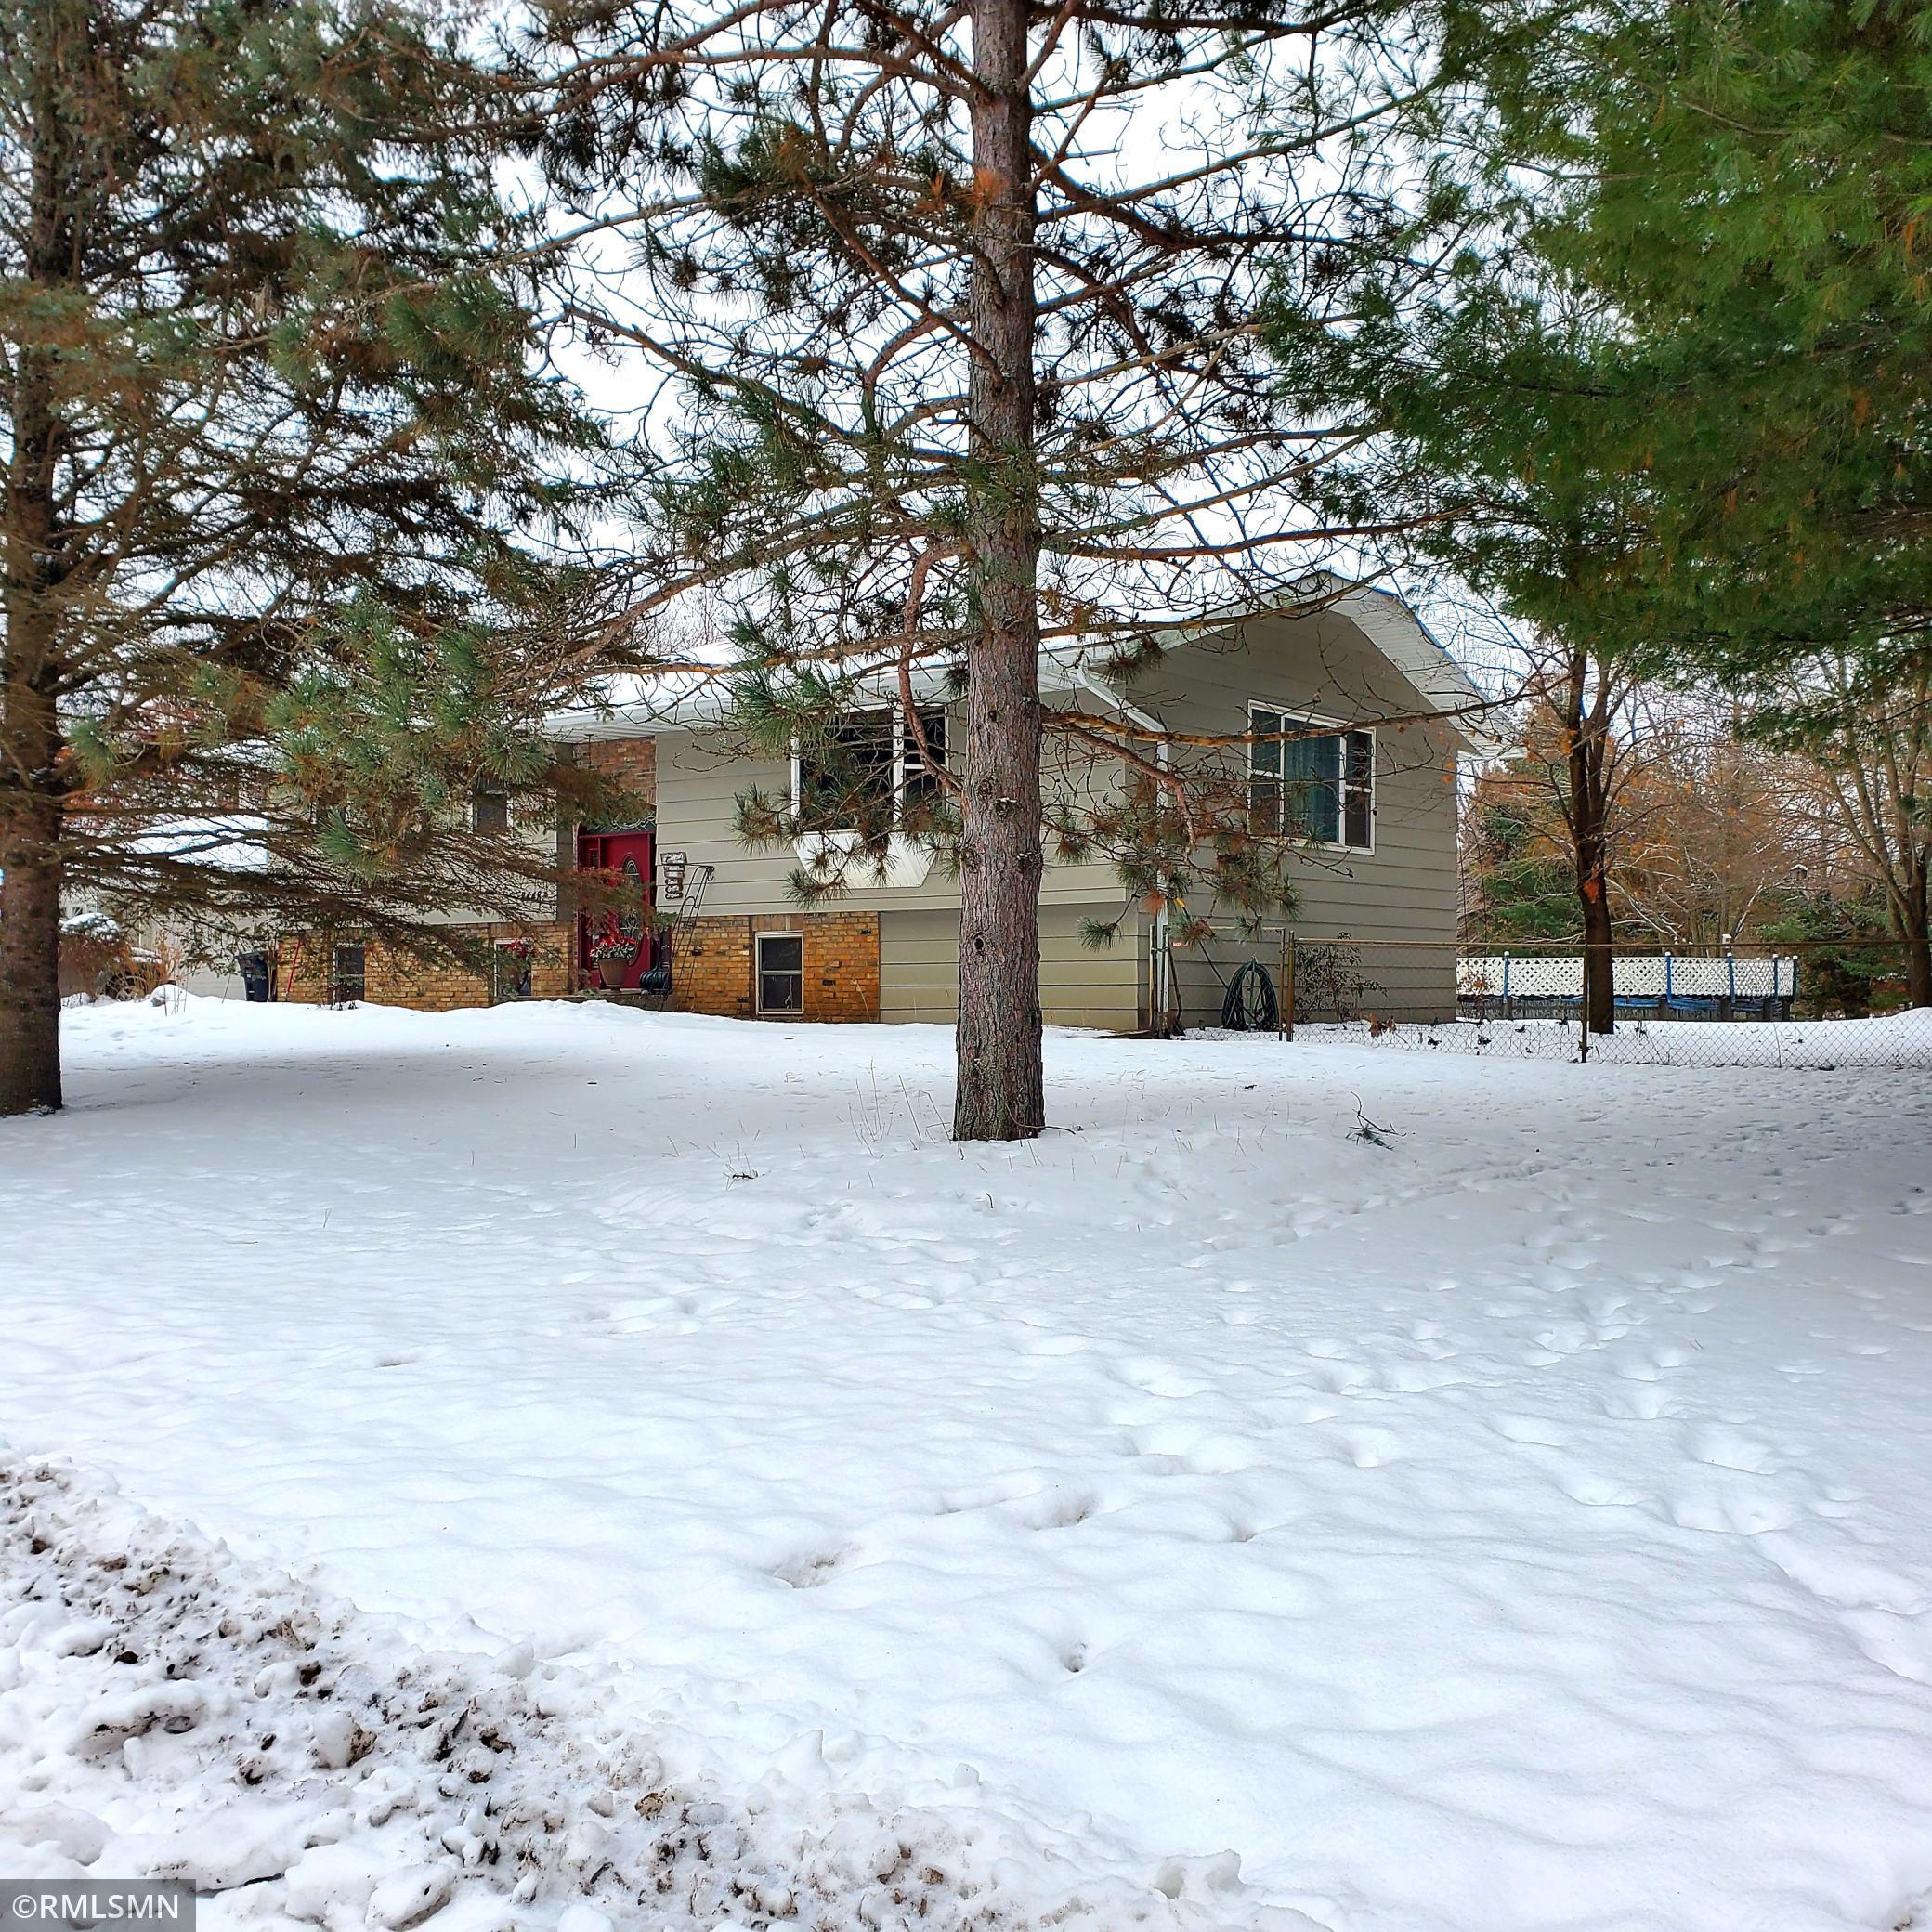 8448 238th Avenue NE Property Photo - Linwood Twp, MN real estate listing